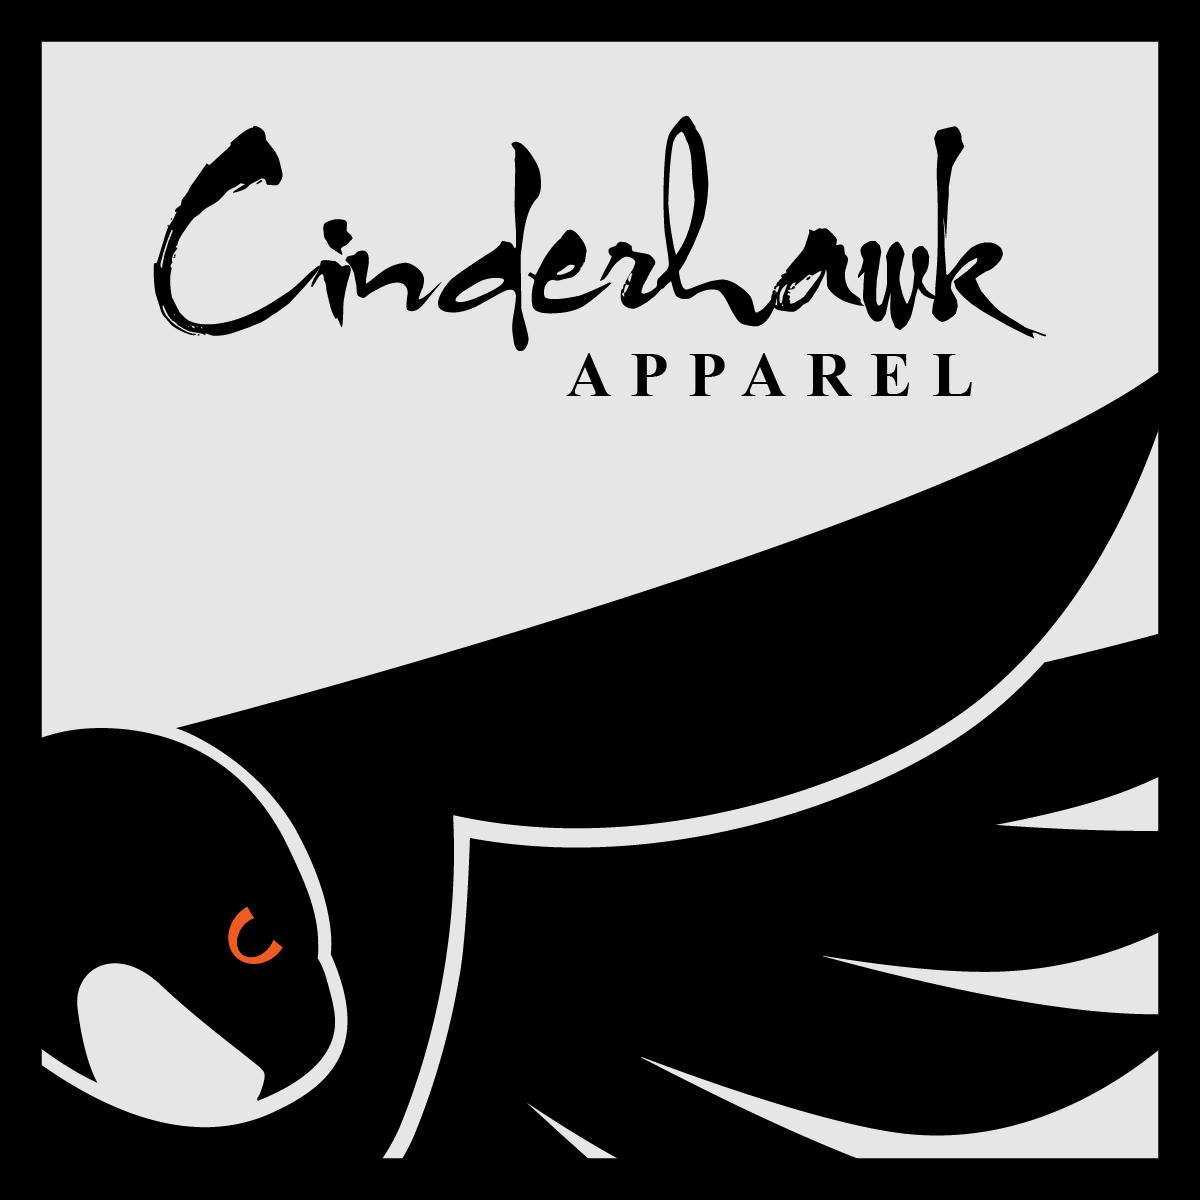 cinderhawk-apparel-logo